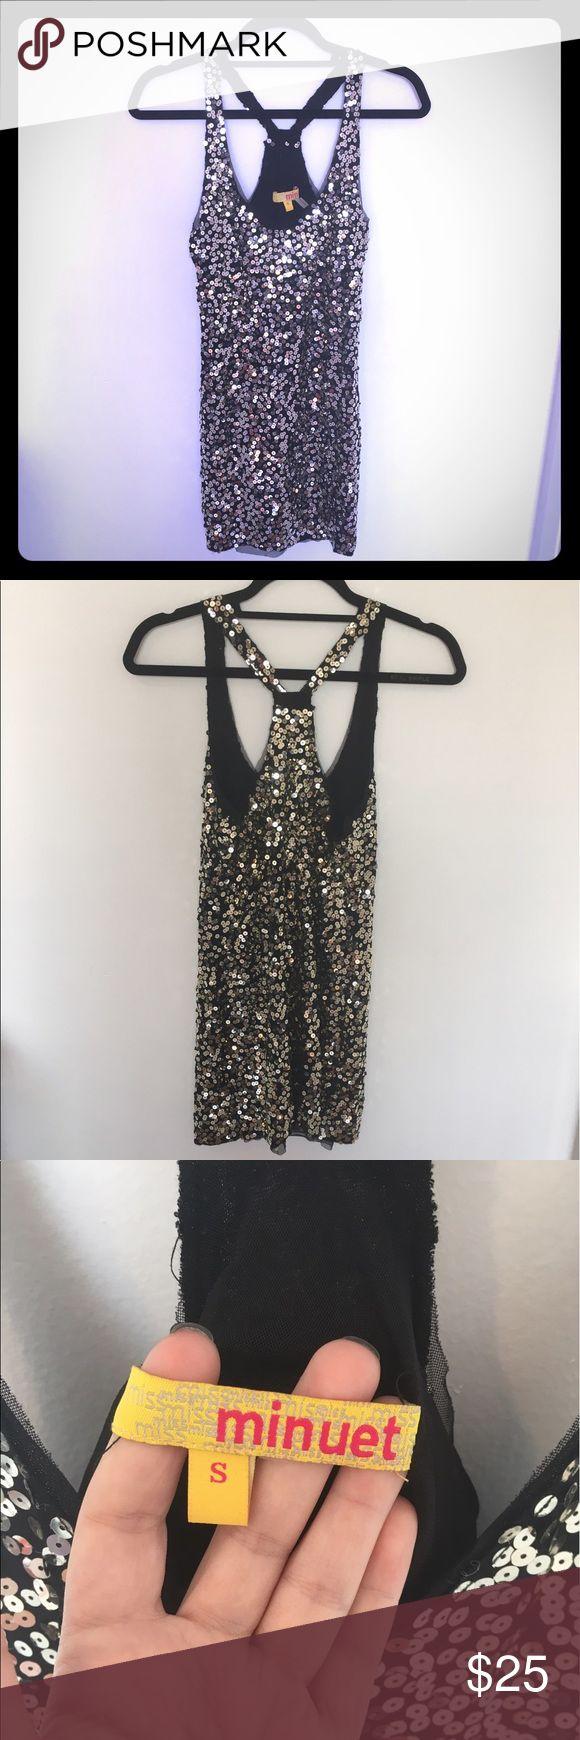 Sequence Dress Great Vegas mini dress. Good condition. Dresses Mini